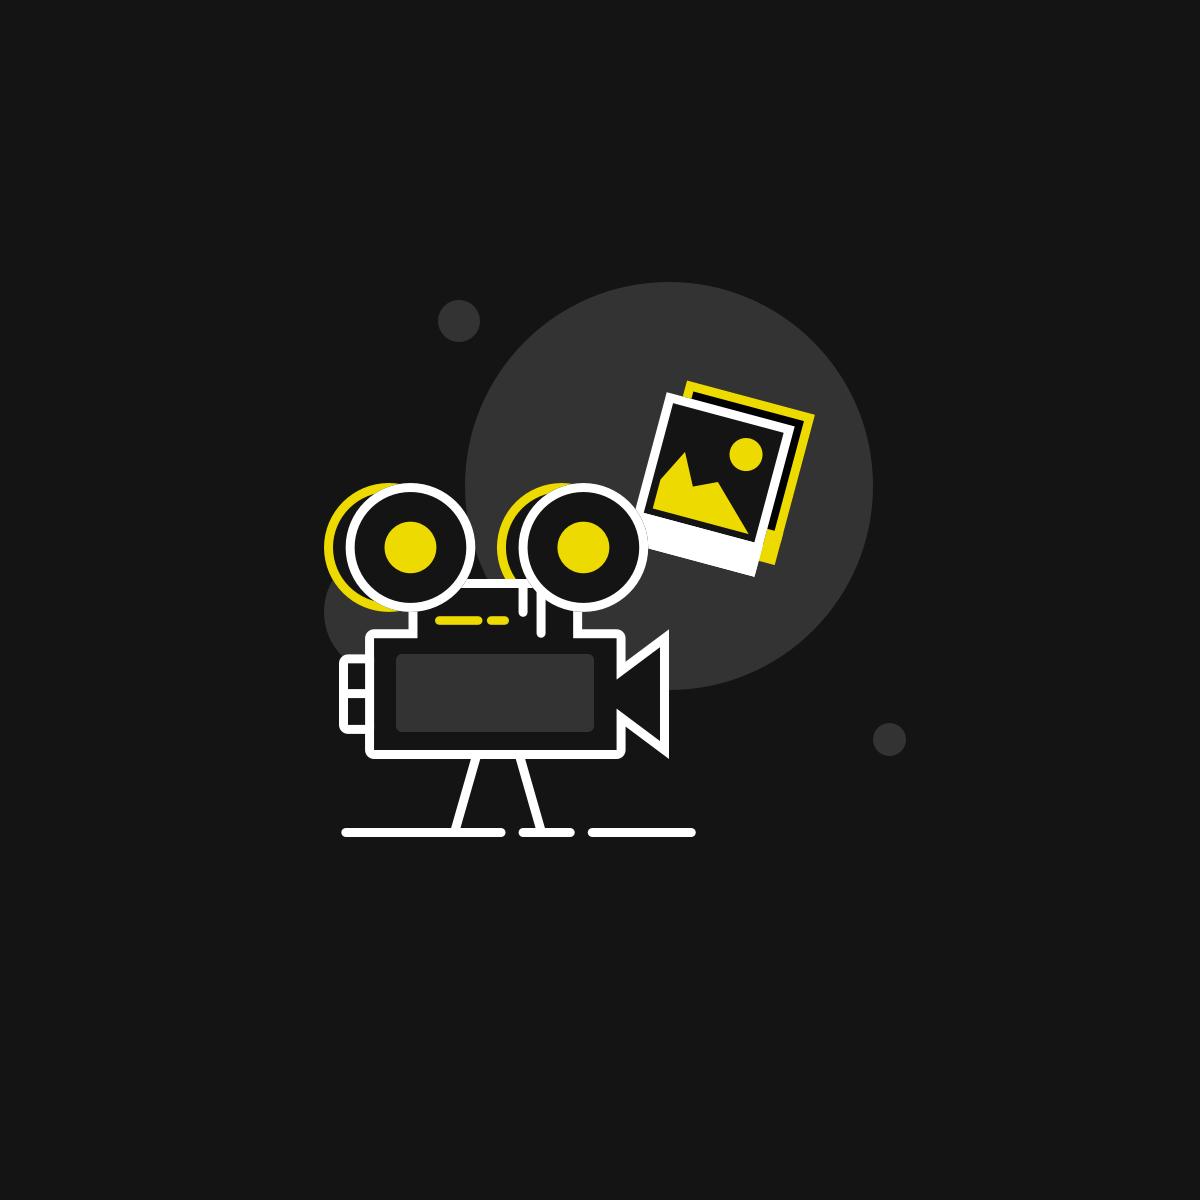 GRAY-icon-production-black-base_gray_yellow@3x